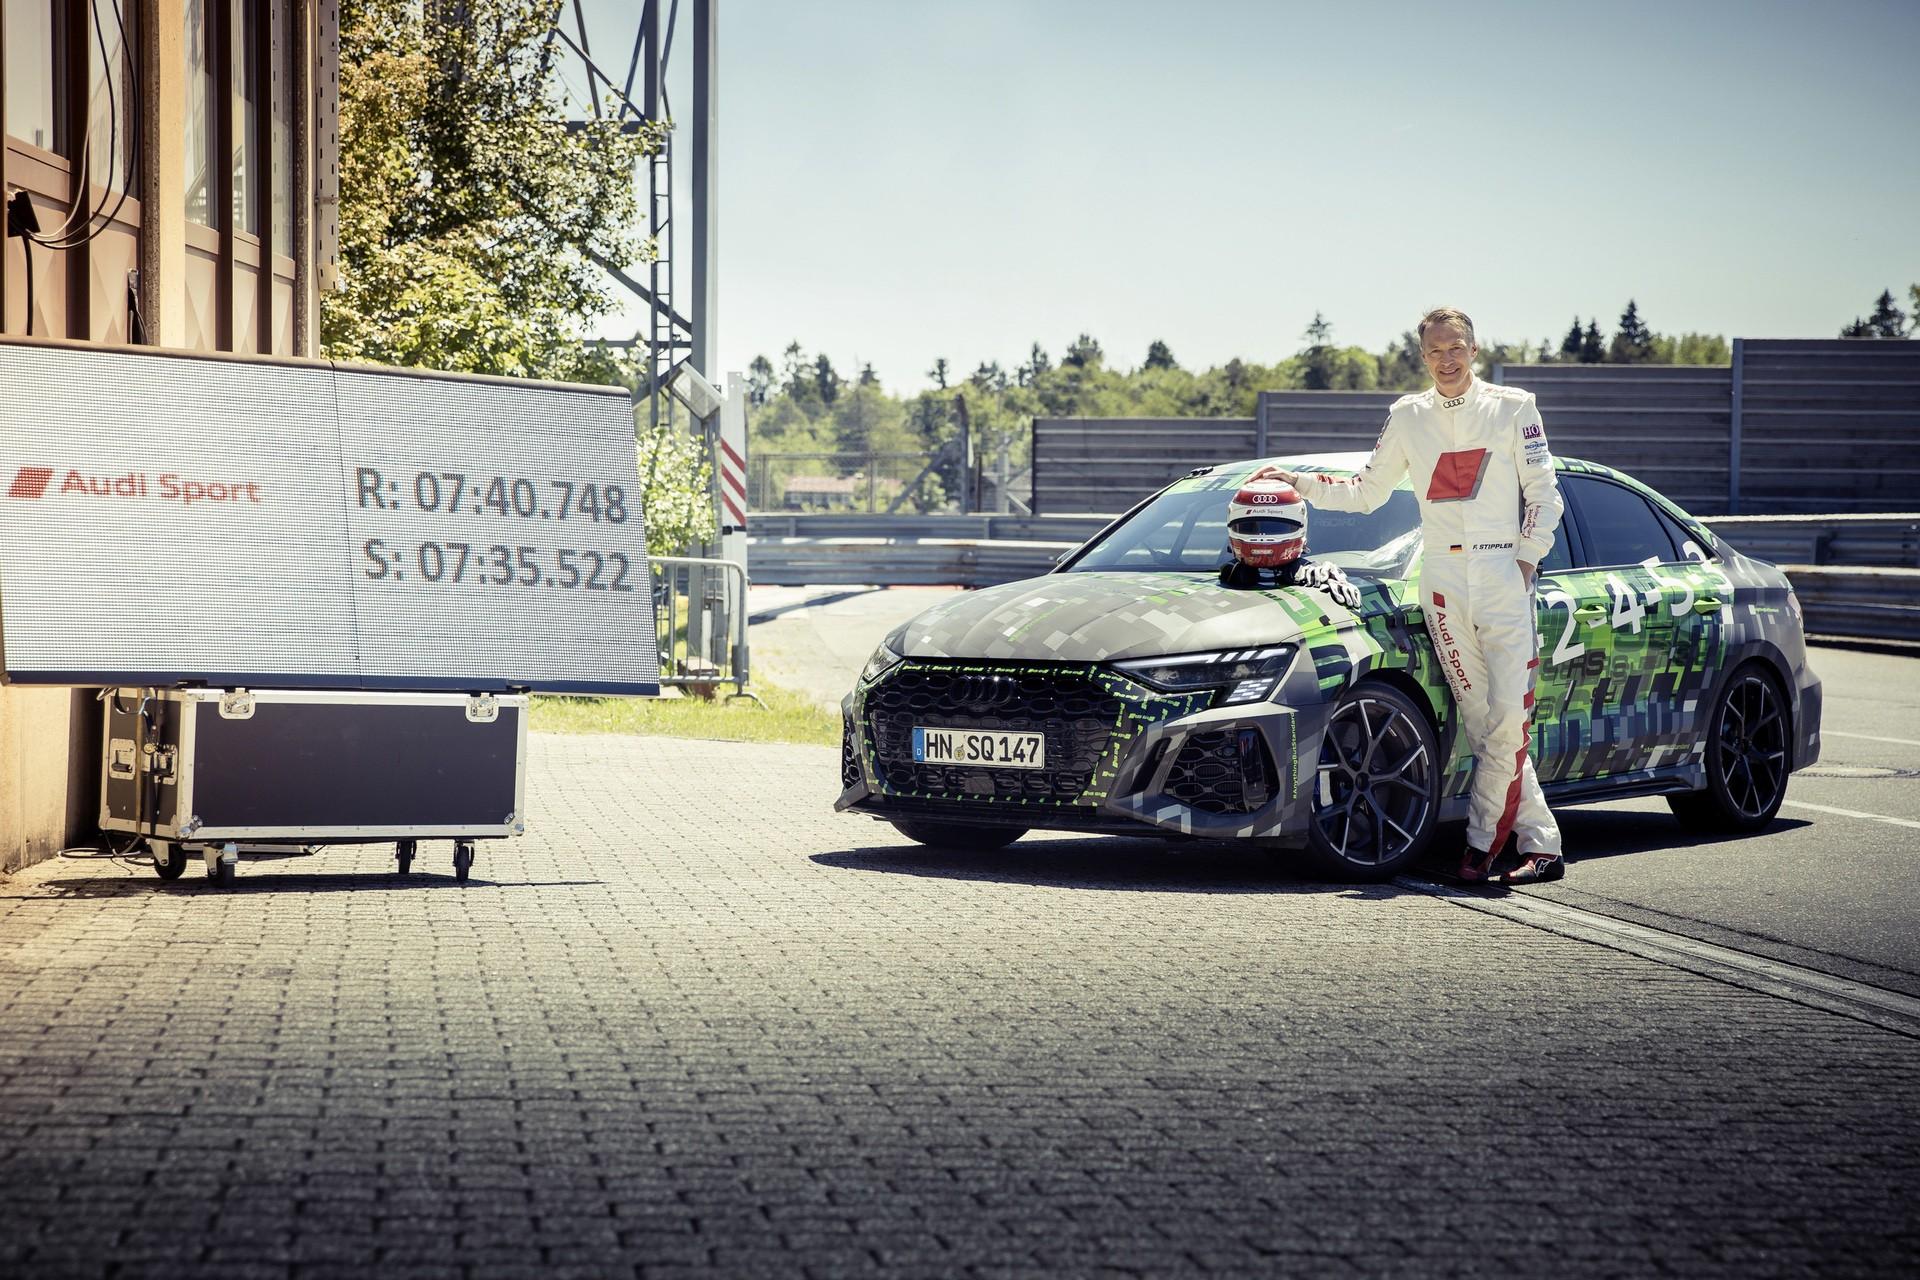 Audi_RS3_Sedan_Nurburgring_lap_record-0002